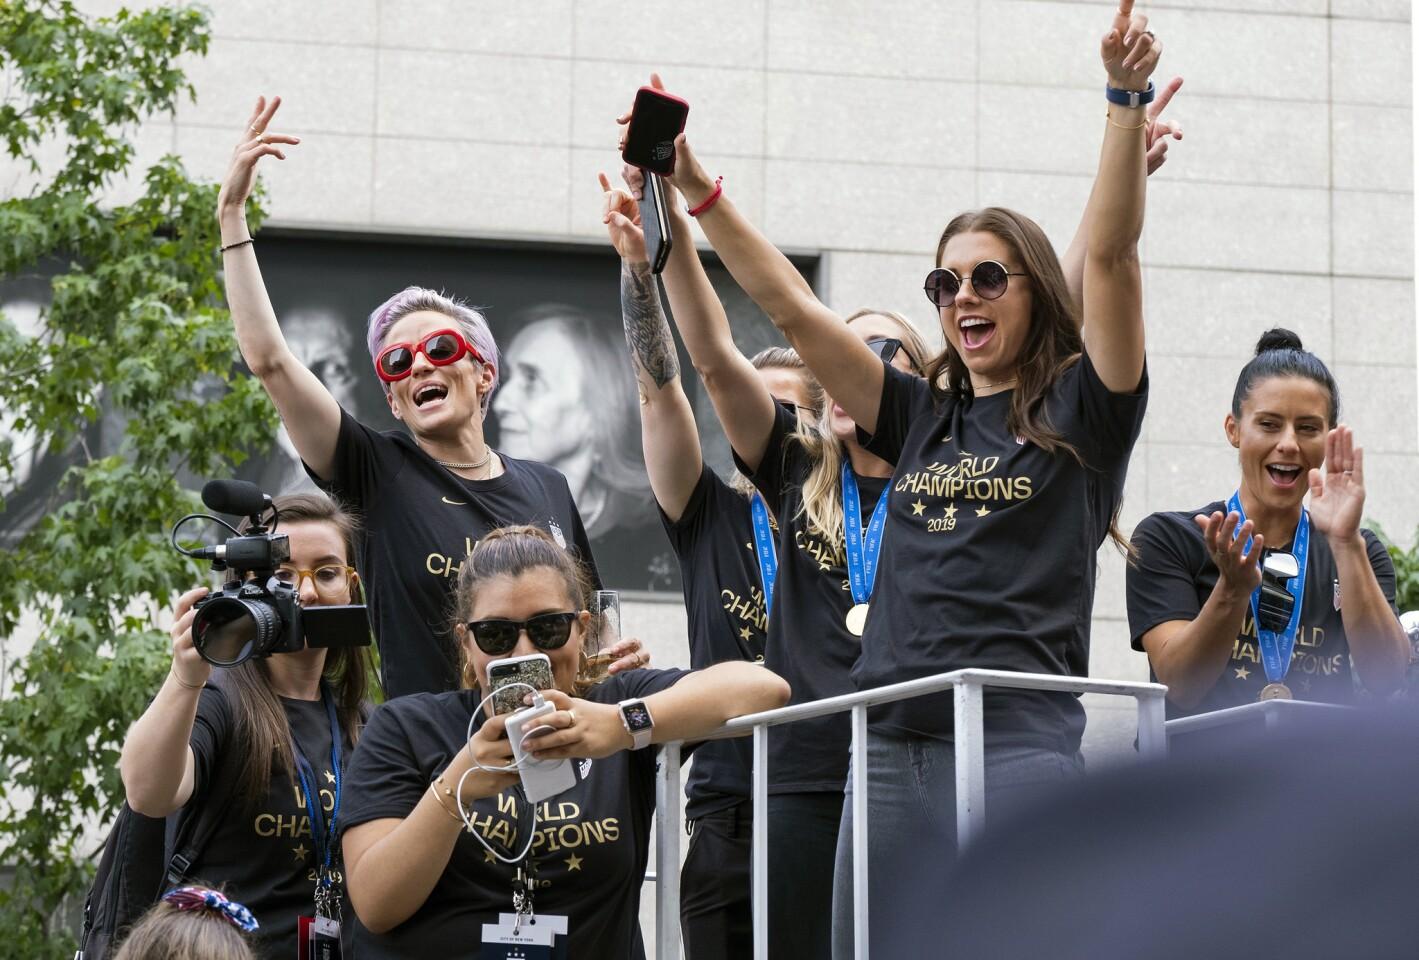 Ticker tape parade for U.S. women's soccer team